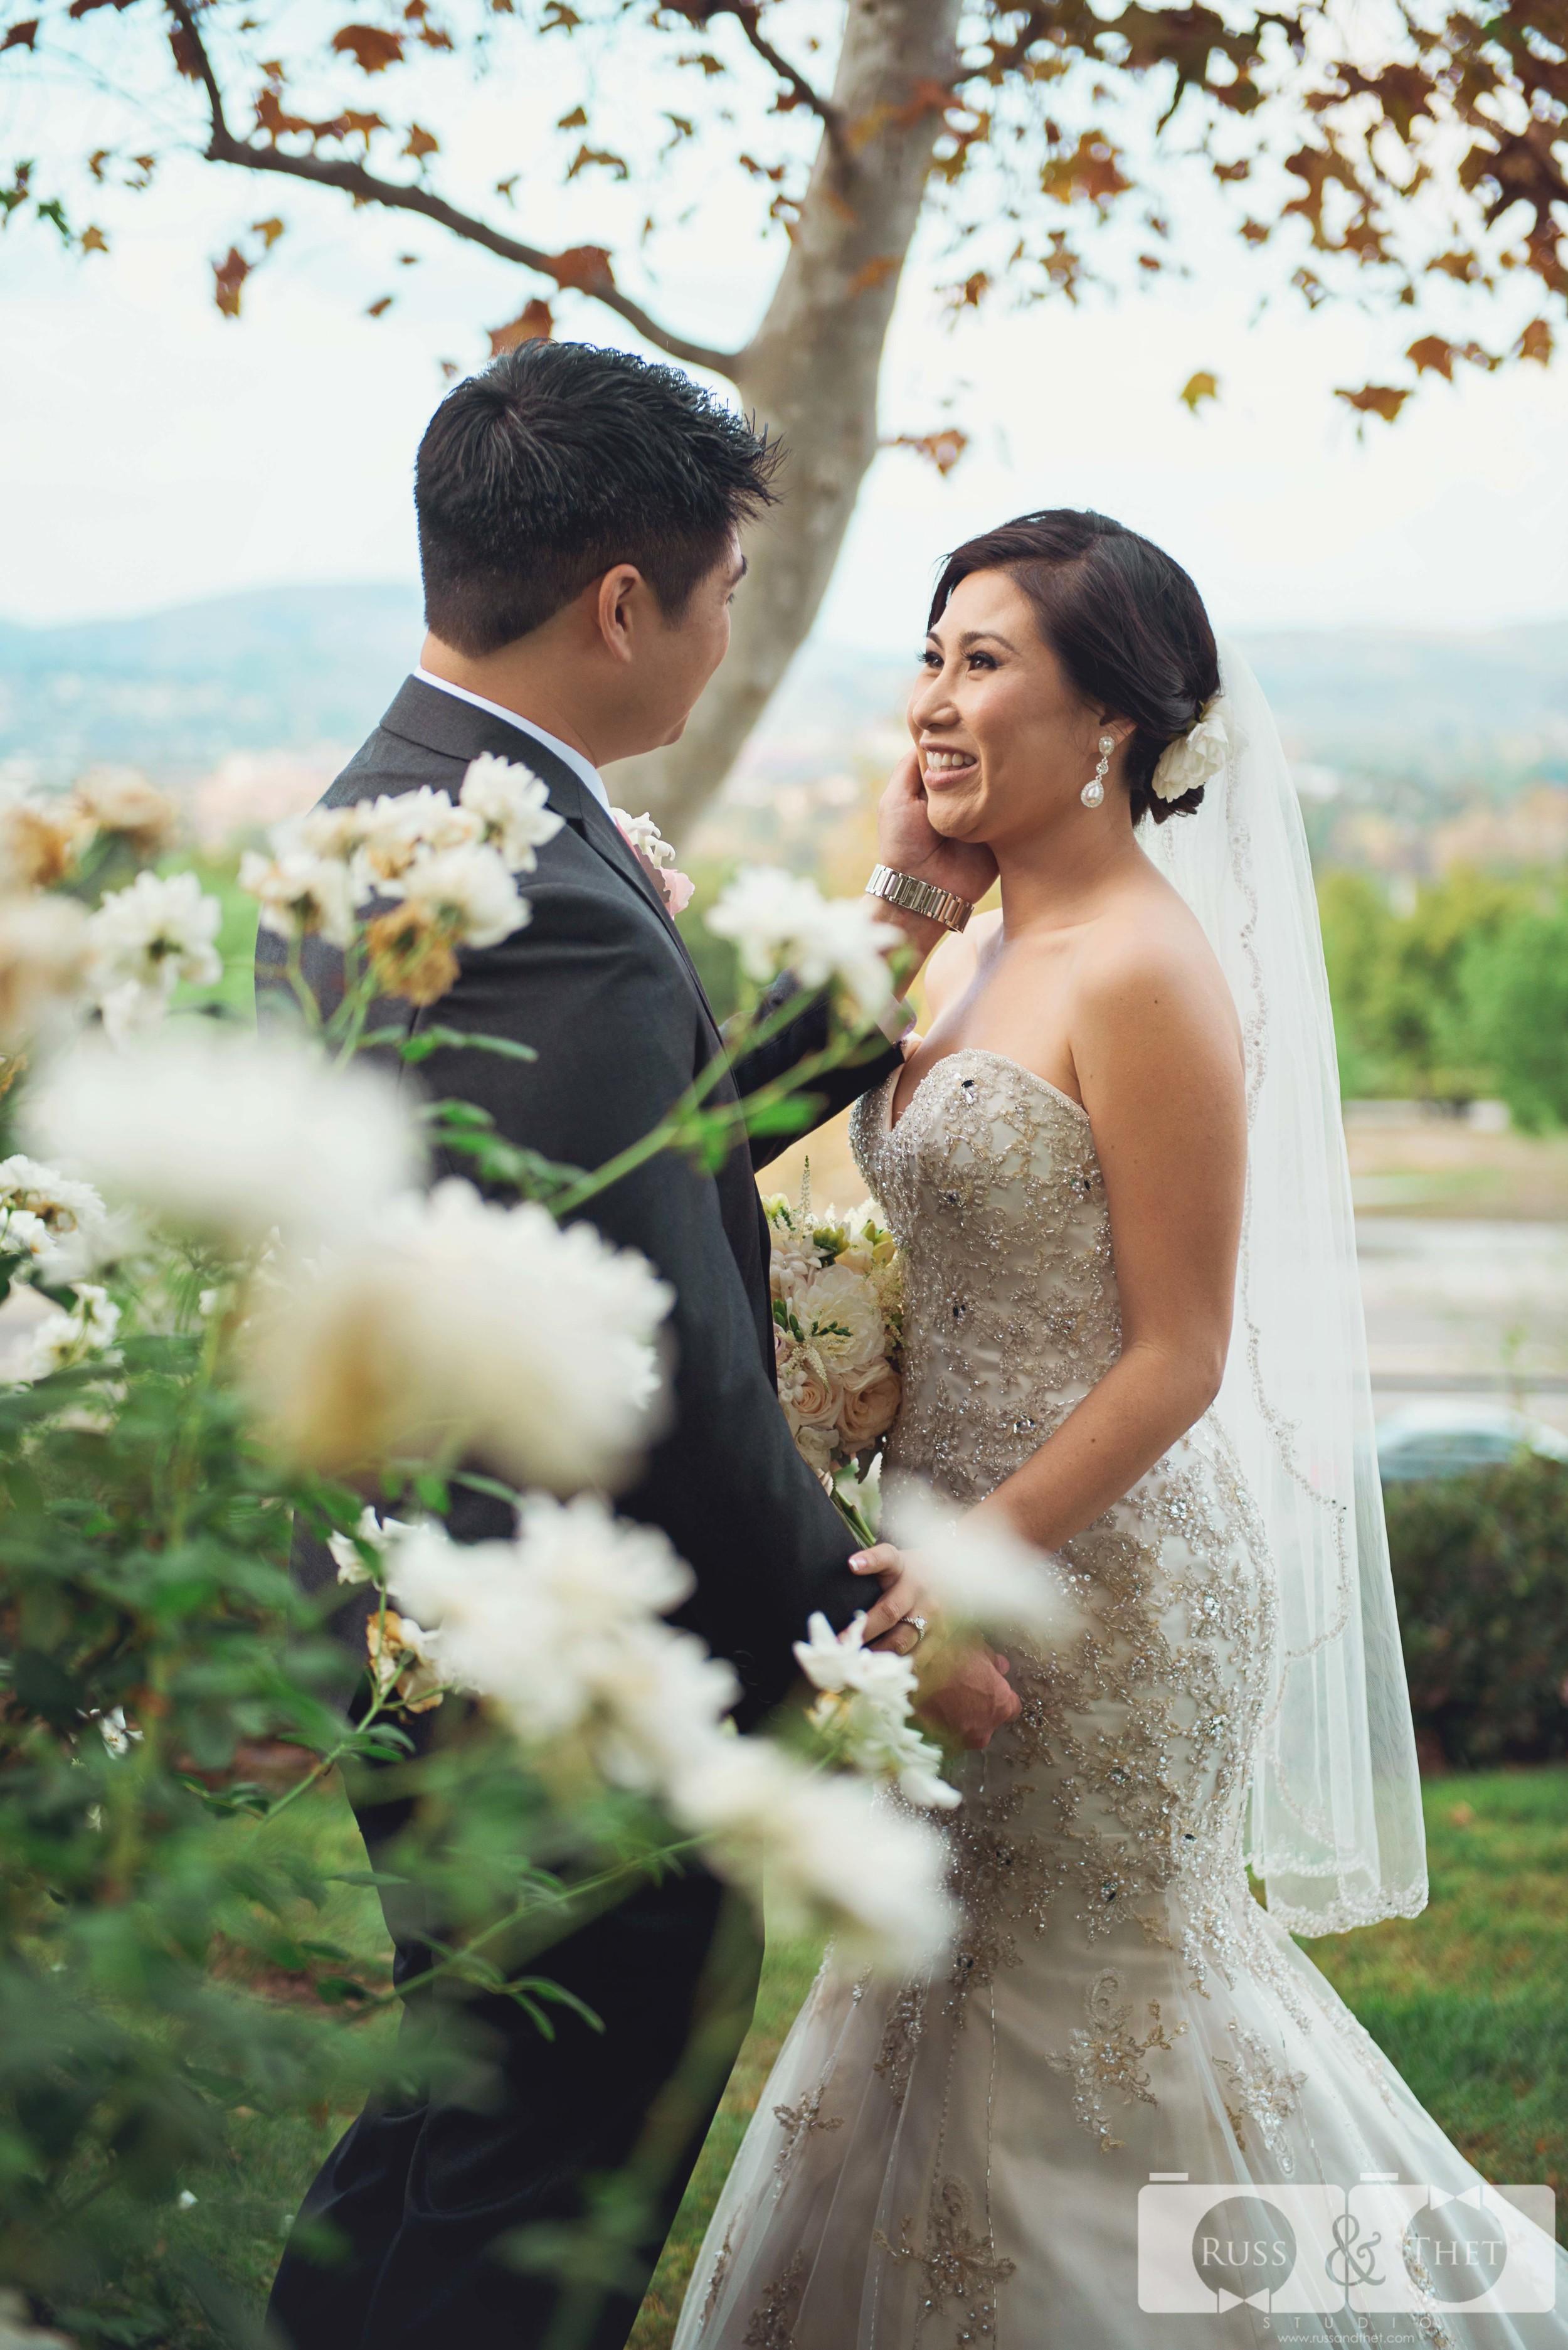 summit-house-fullerton-wedding-photographer-107.JPG